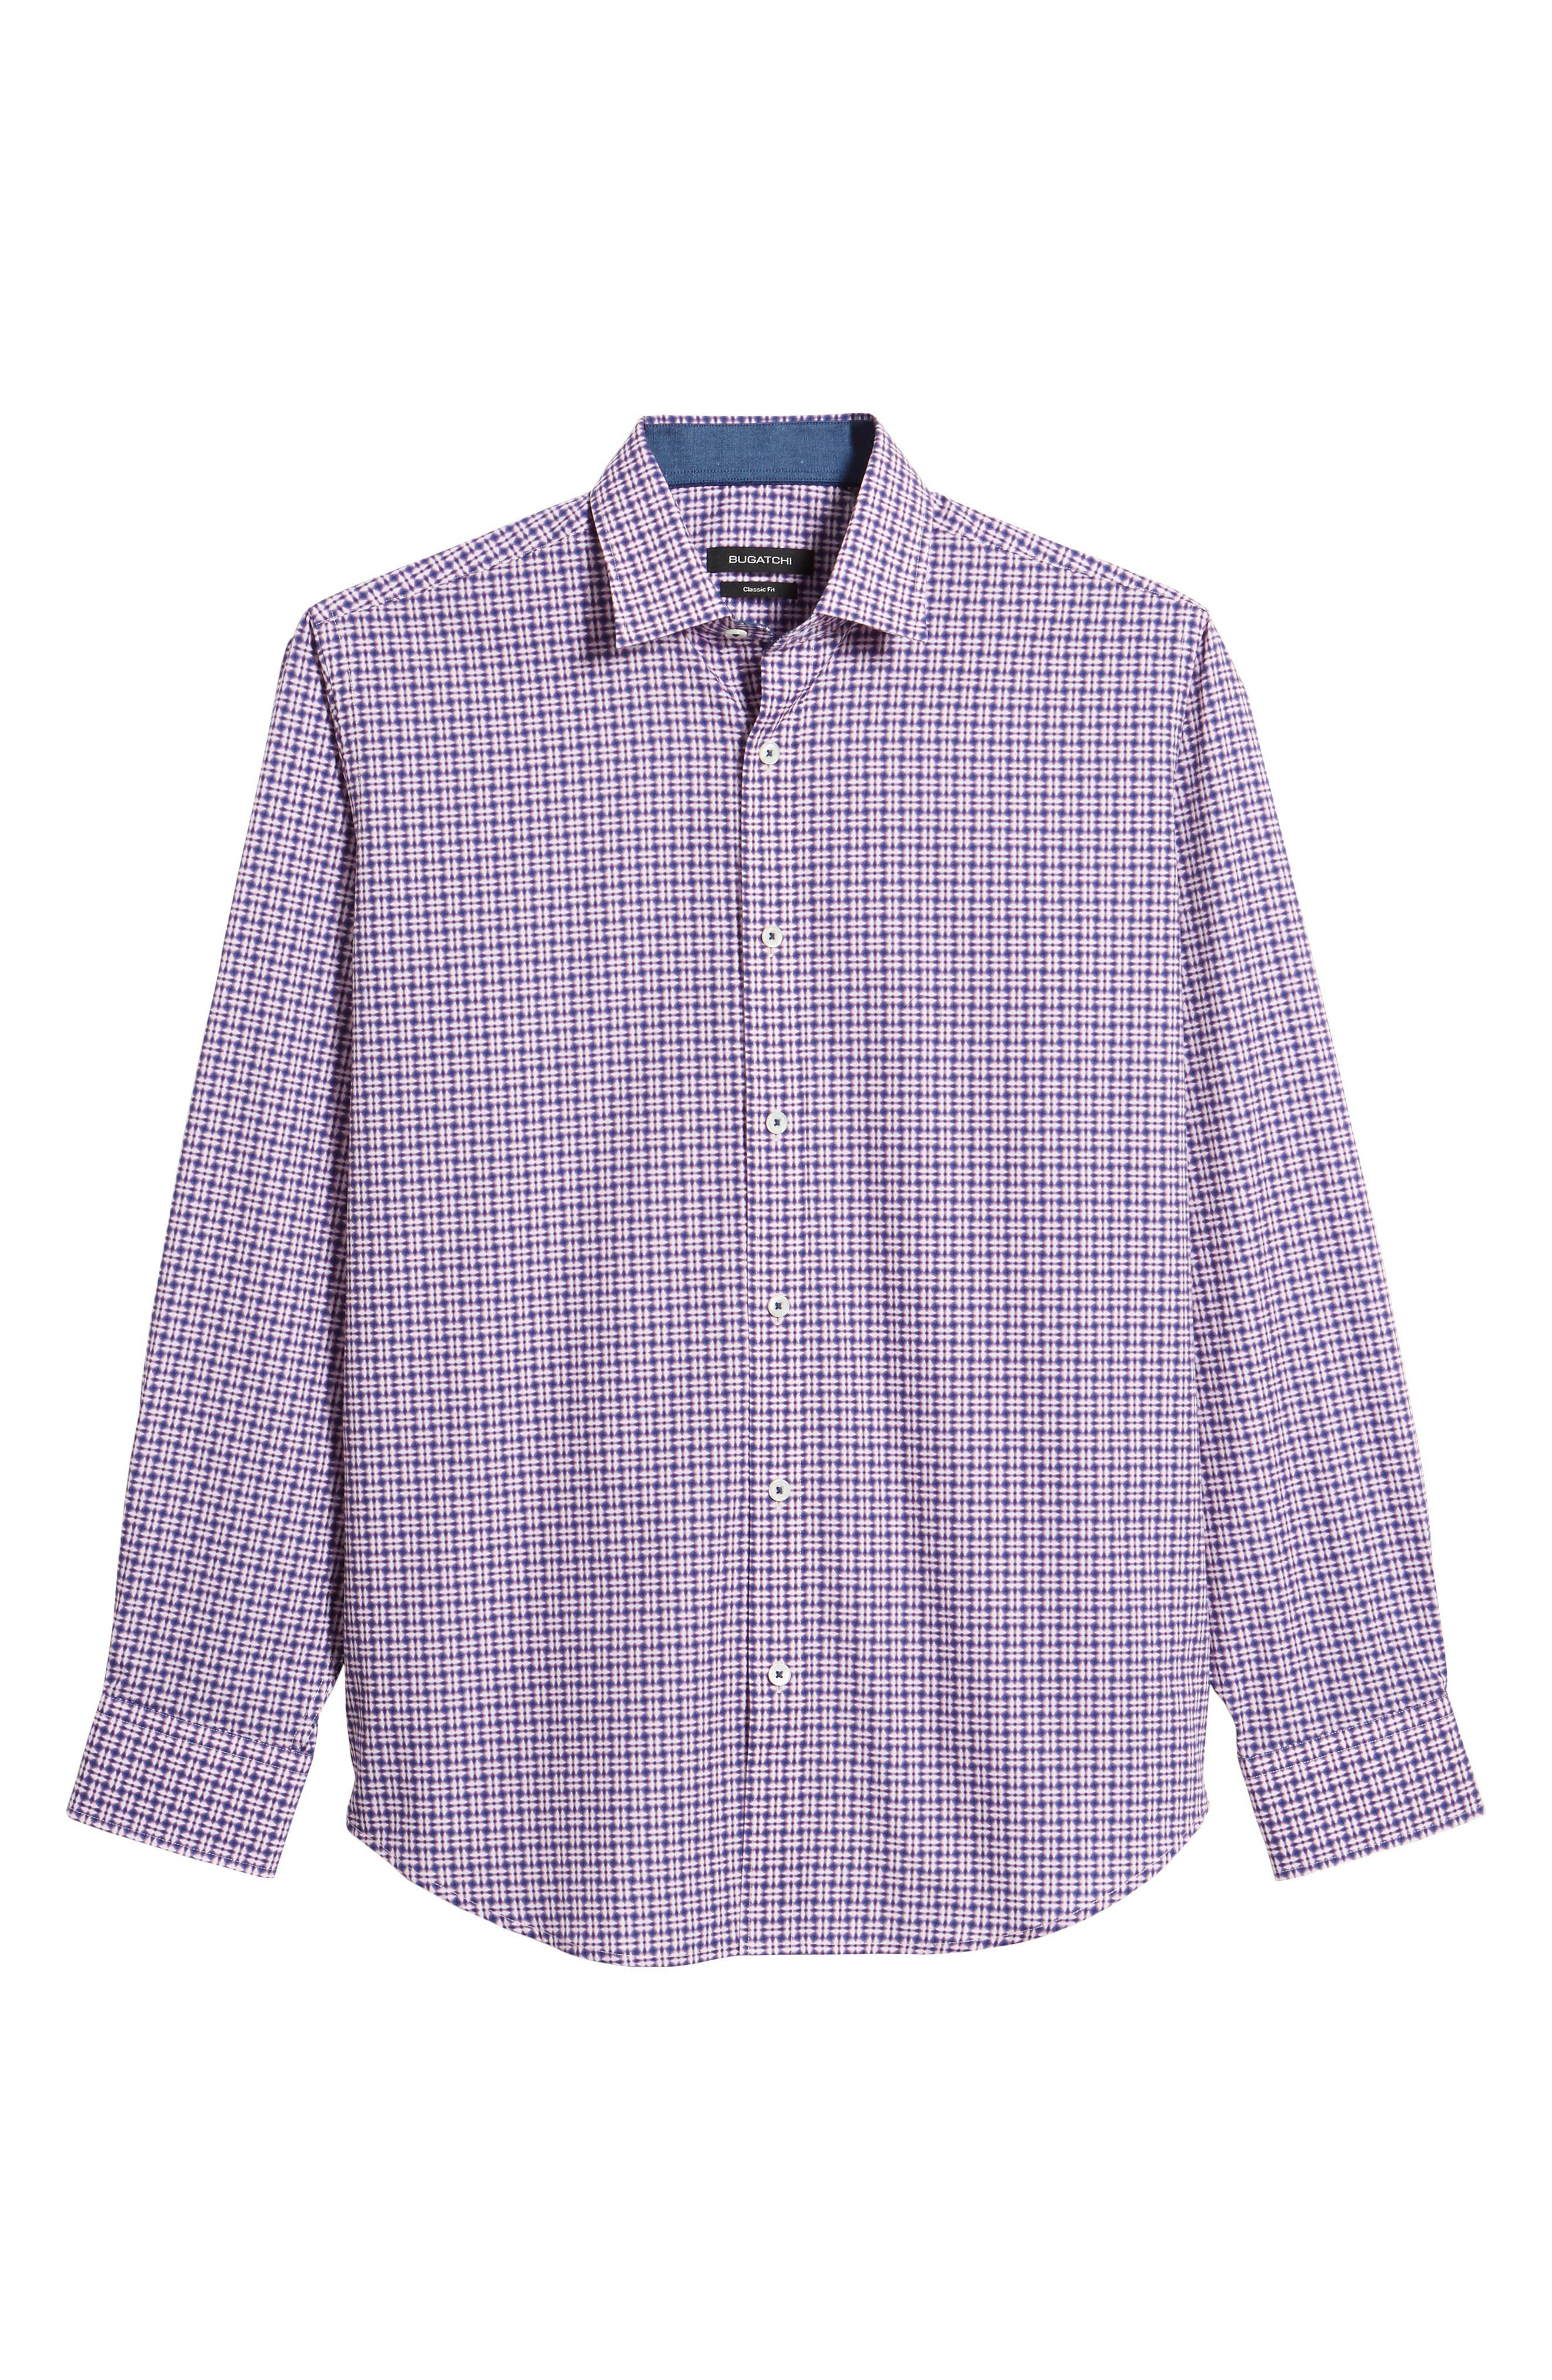 Classic Fit Woven Sport Shirt,                             Alternate thumbnail 6, color,                             682